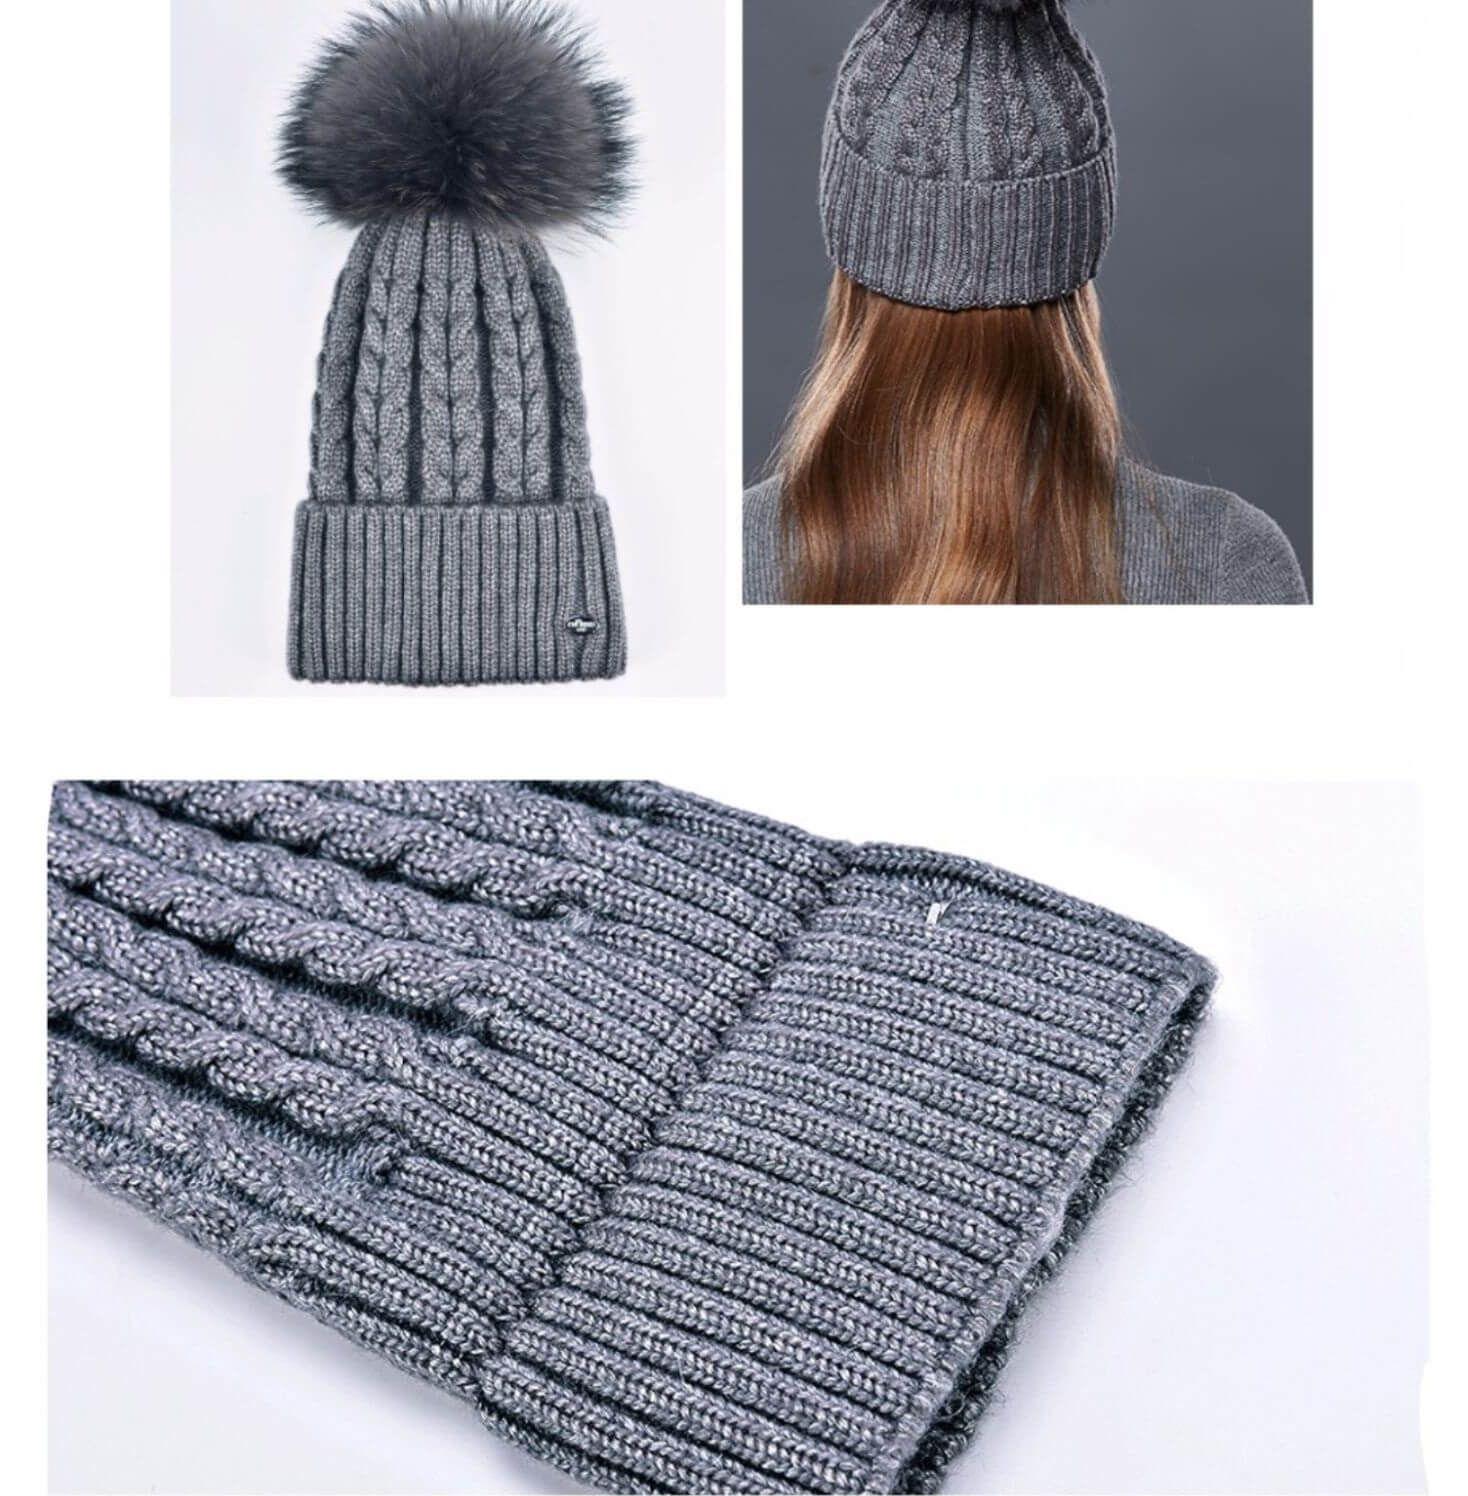 Шапка бини с косами спицами (схема вязания) | Шапка, Вязание